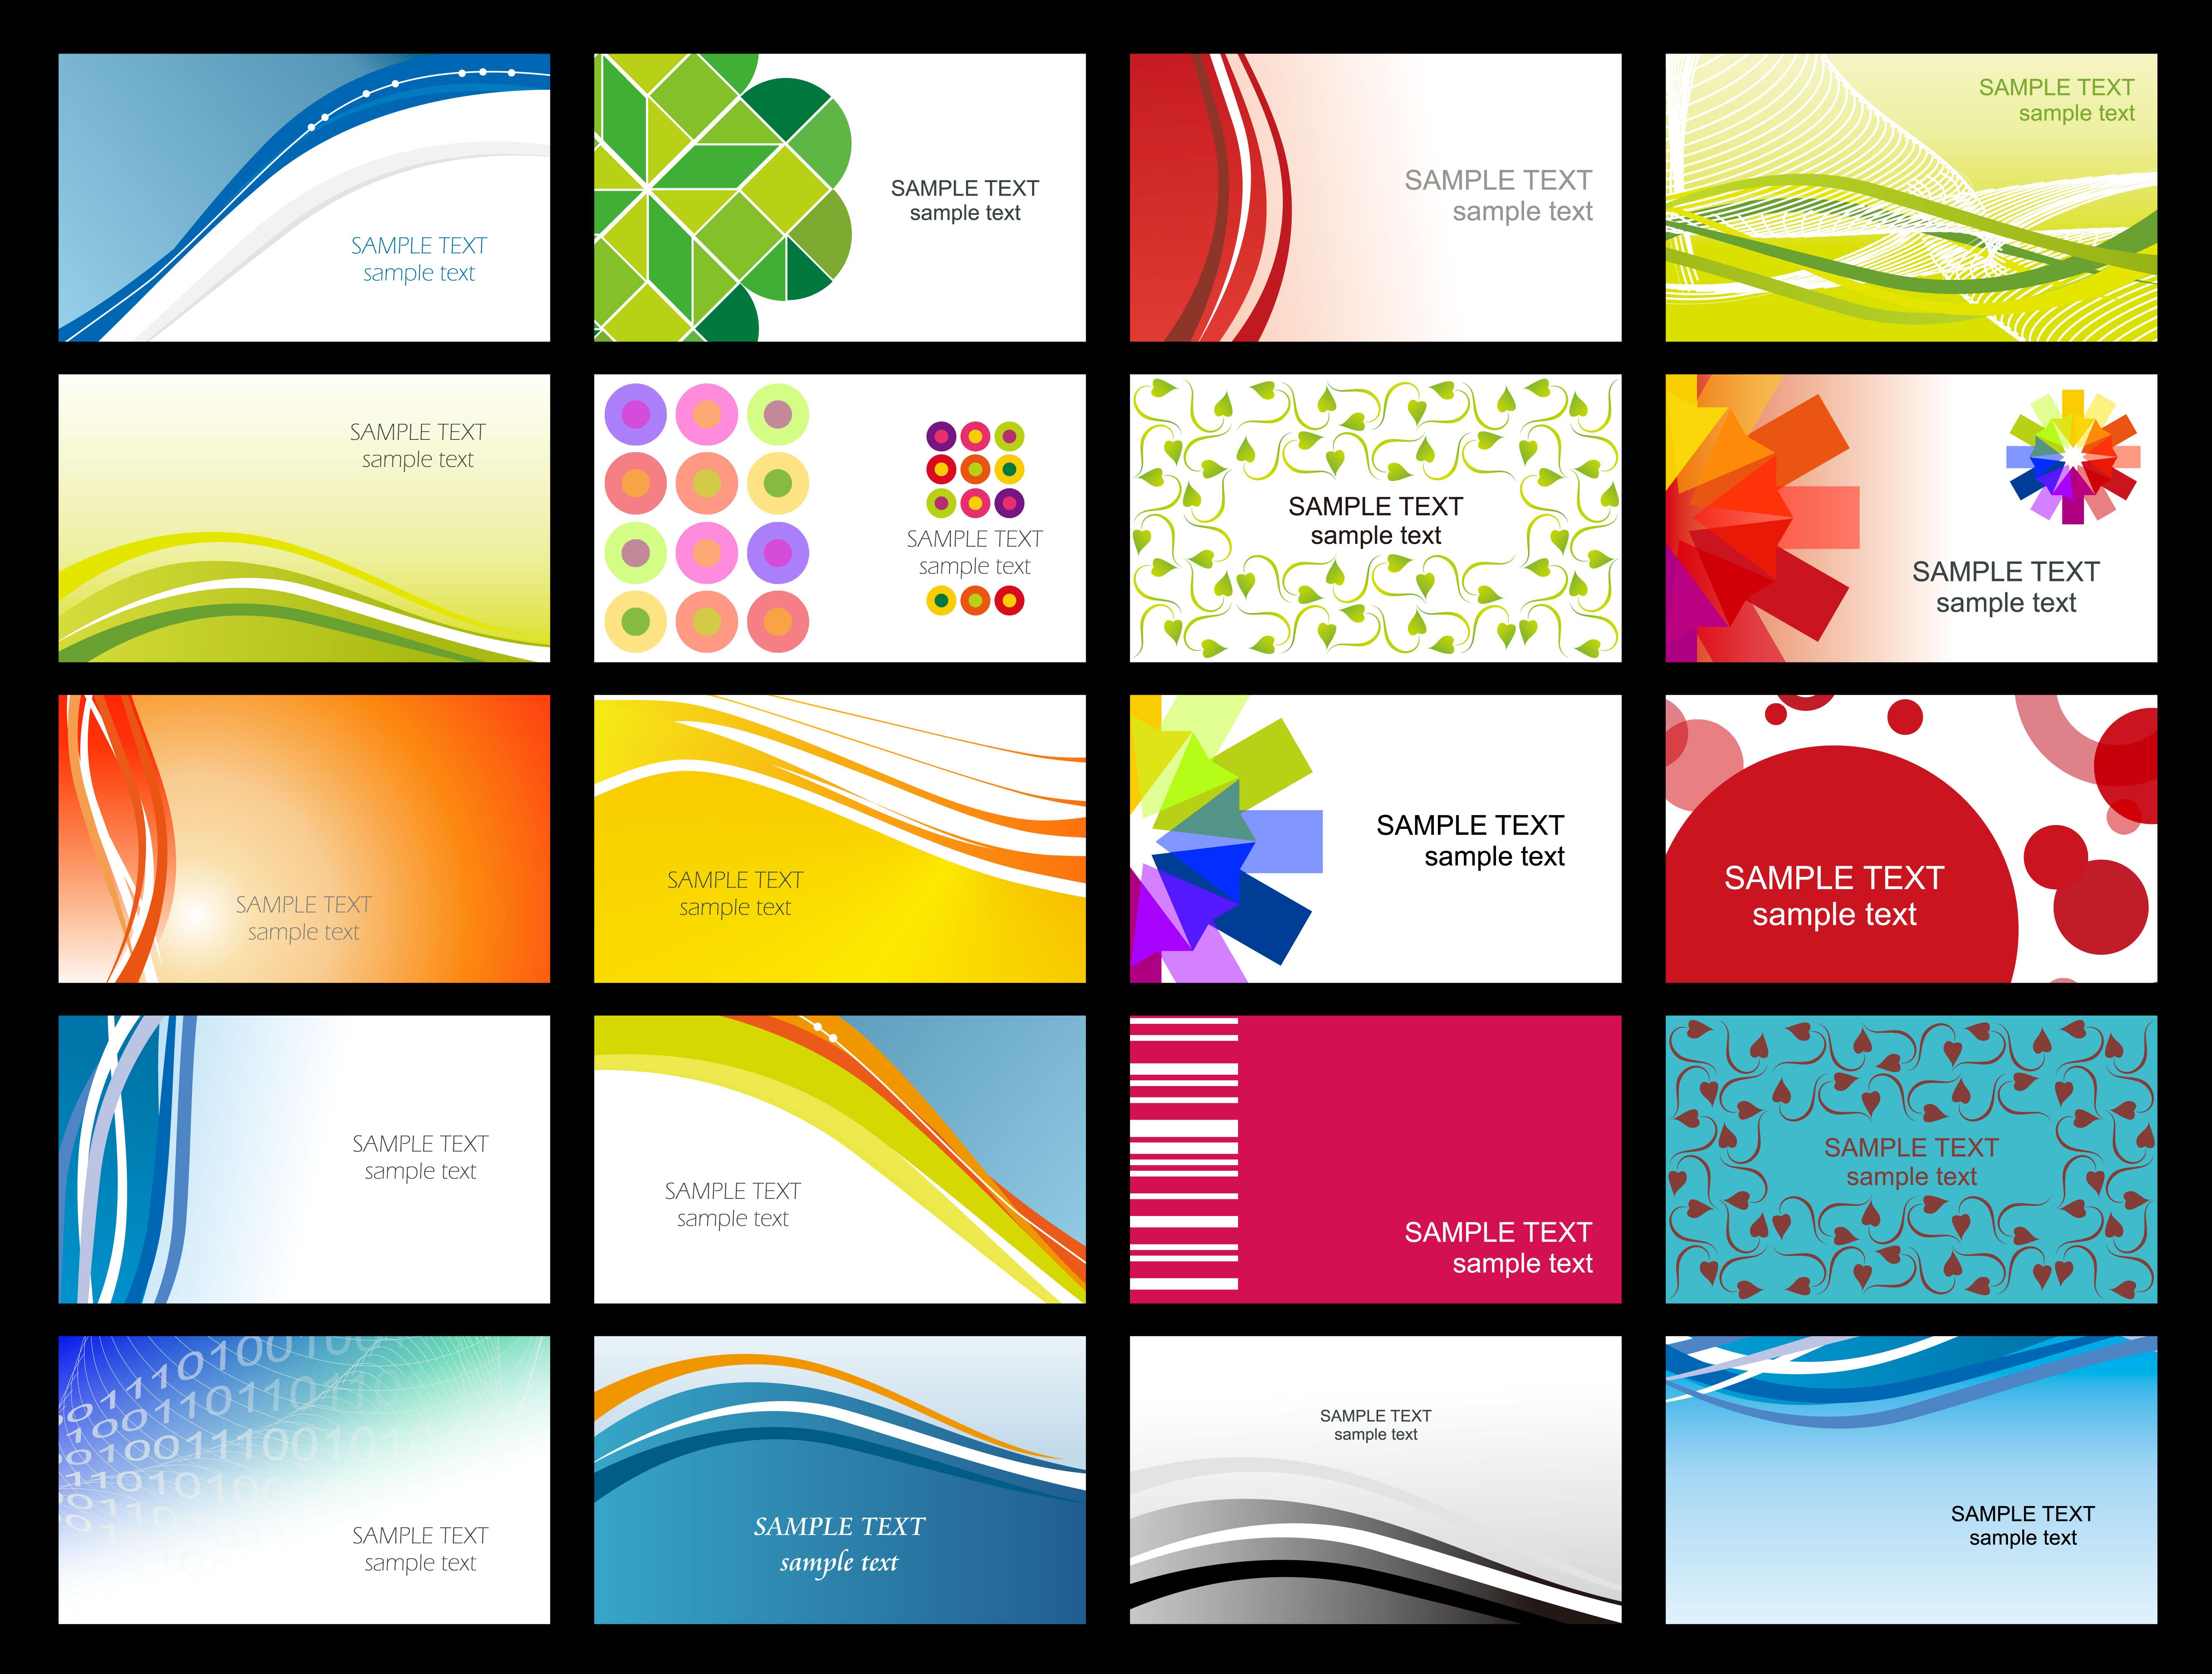 Free Printable Business Card Templates Sample | Get Sniffer - Free Printable Business Cards